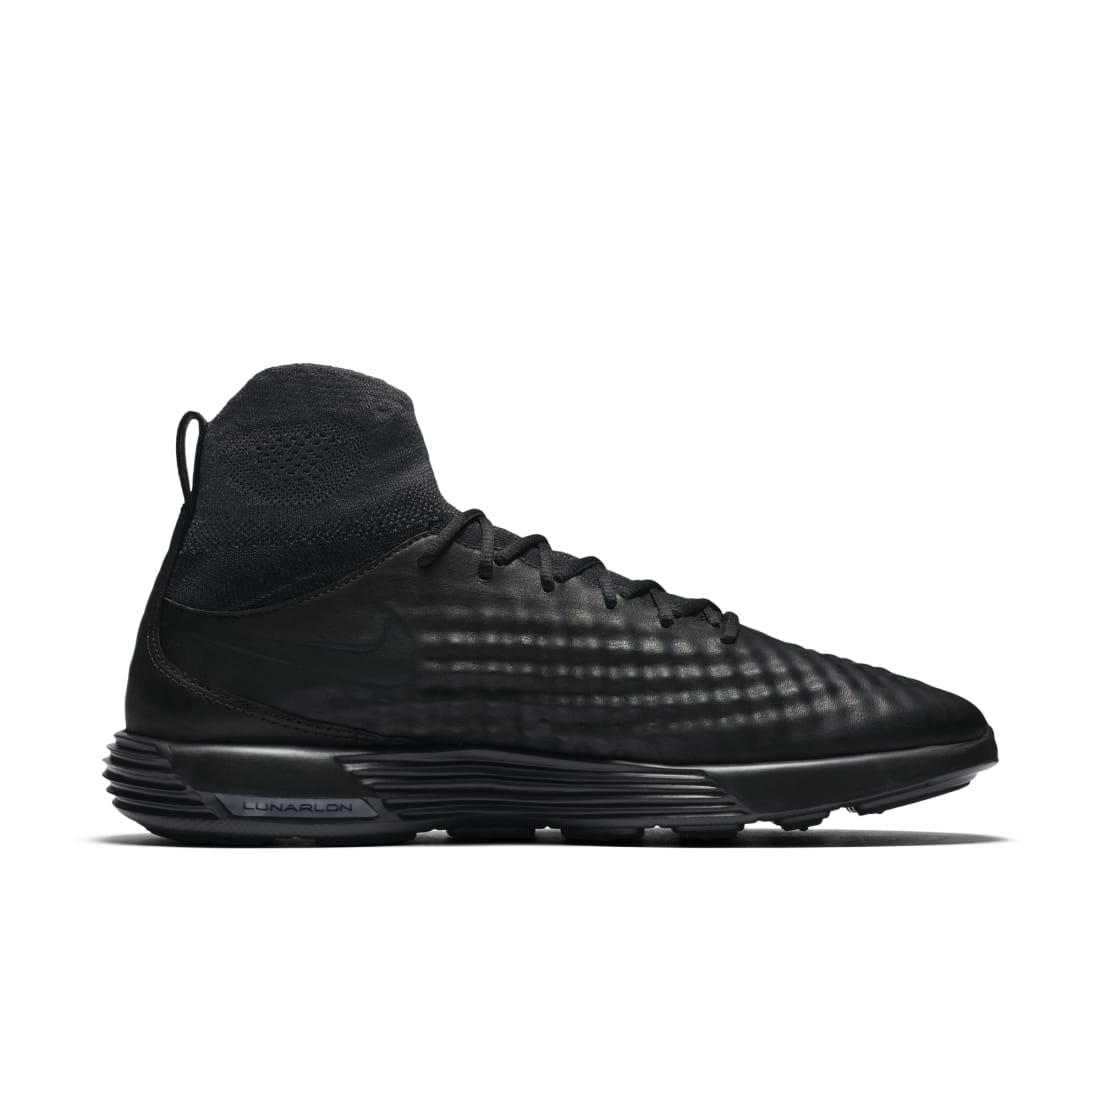 Nike Magista 2 Flyknit Black/Black-Anthracite-White